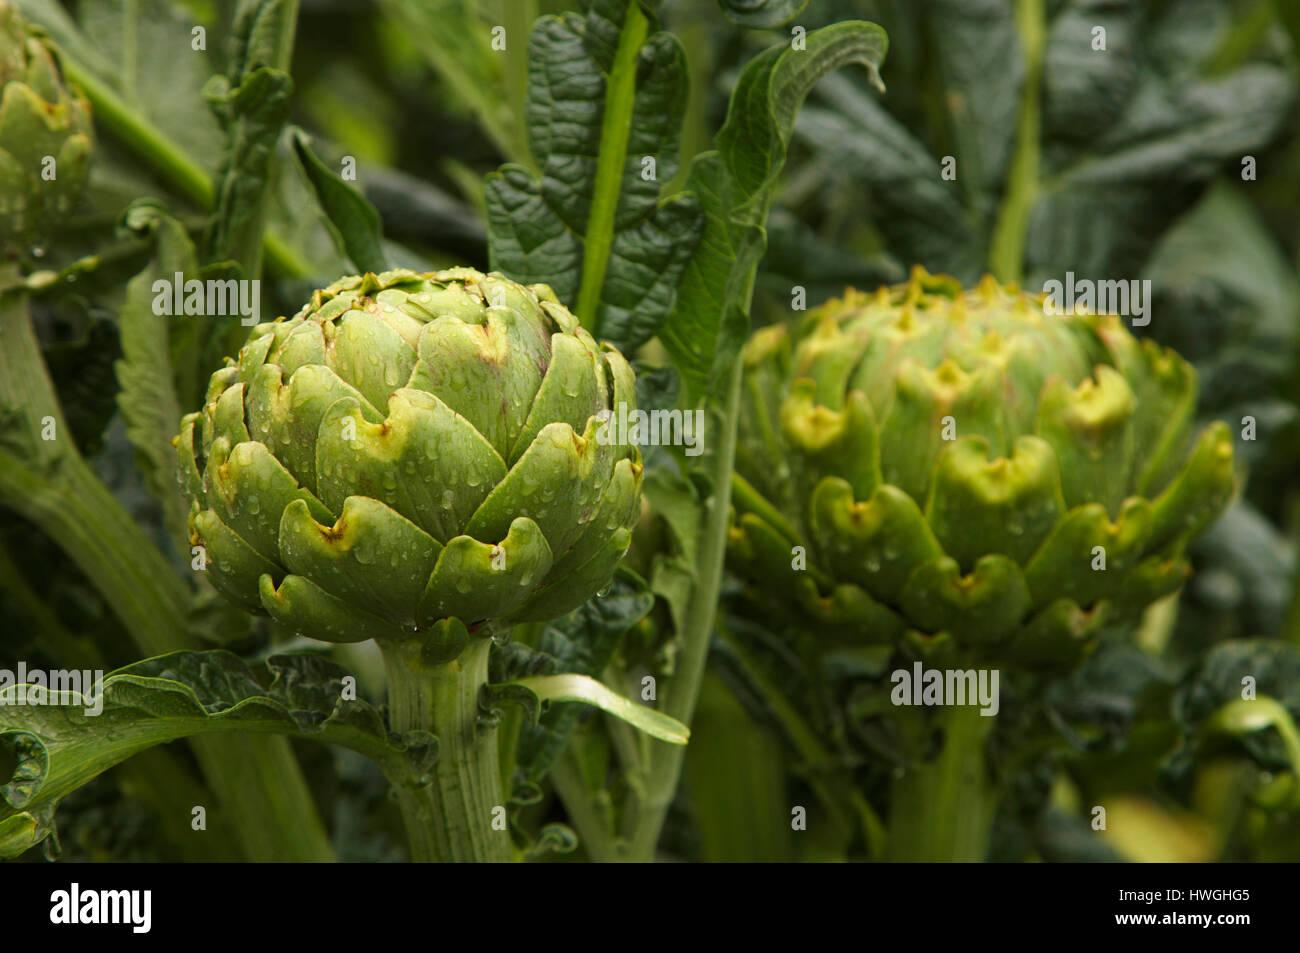 glossy green artichokes growing in vegatable patch Cynara cardunculus - Stock Image